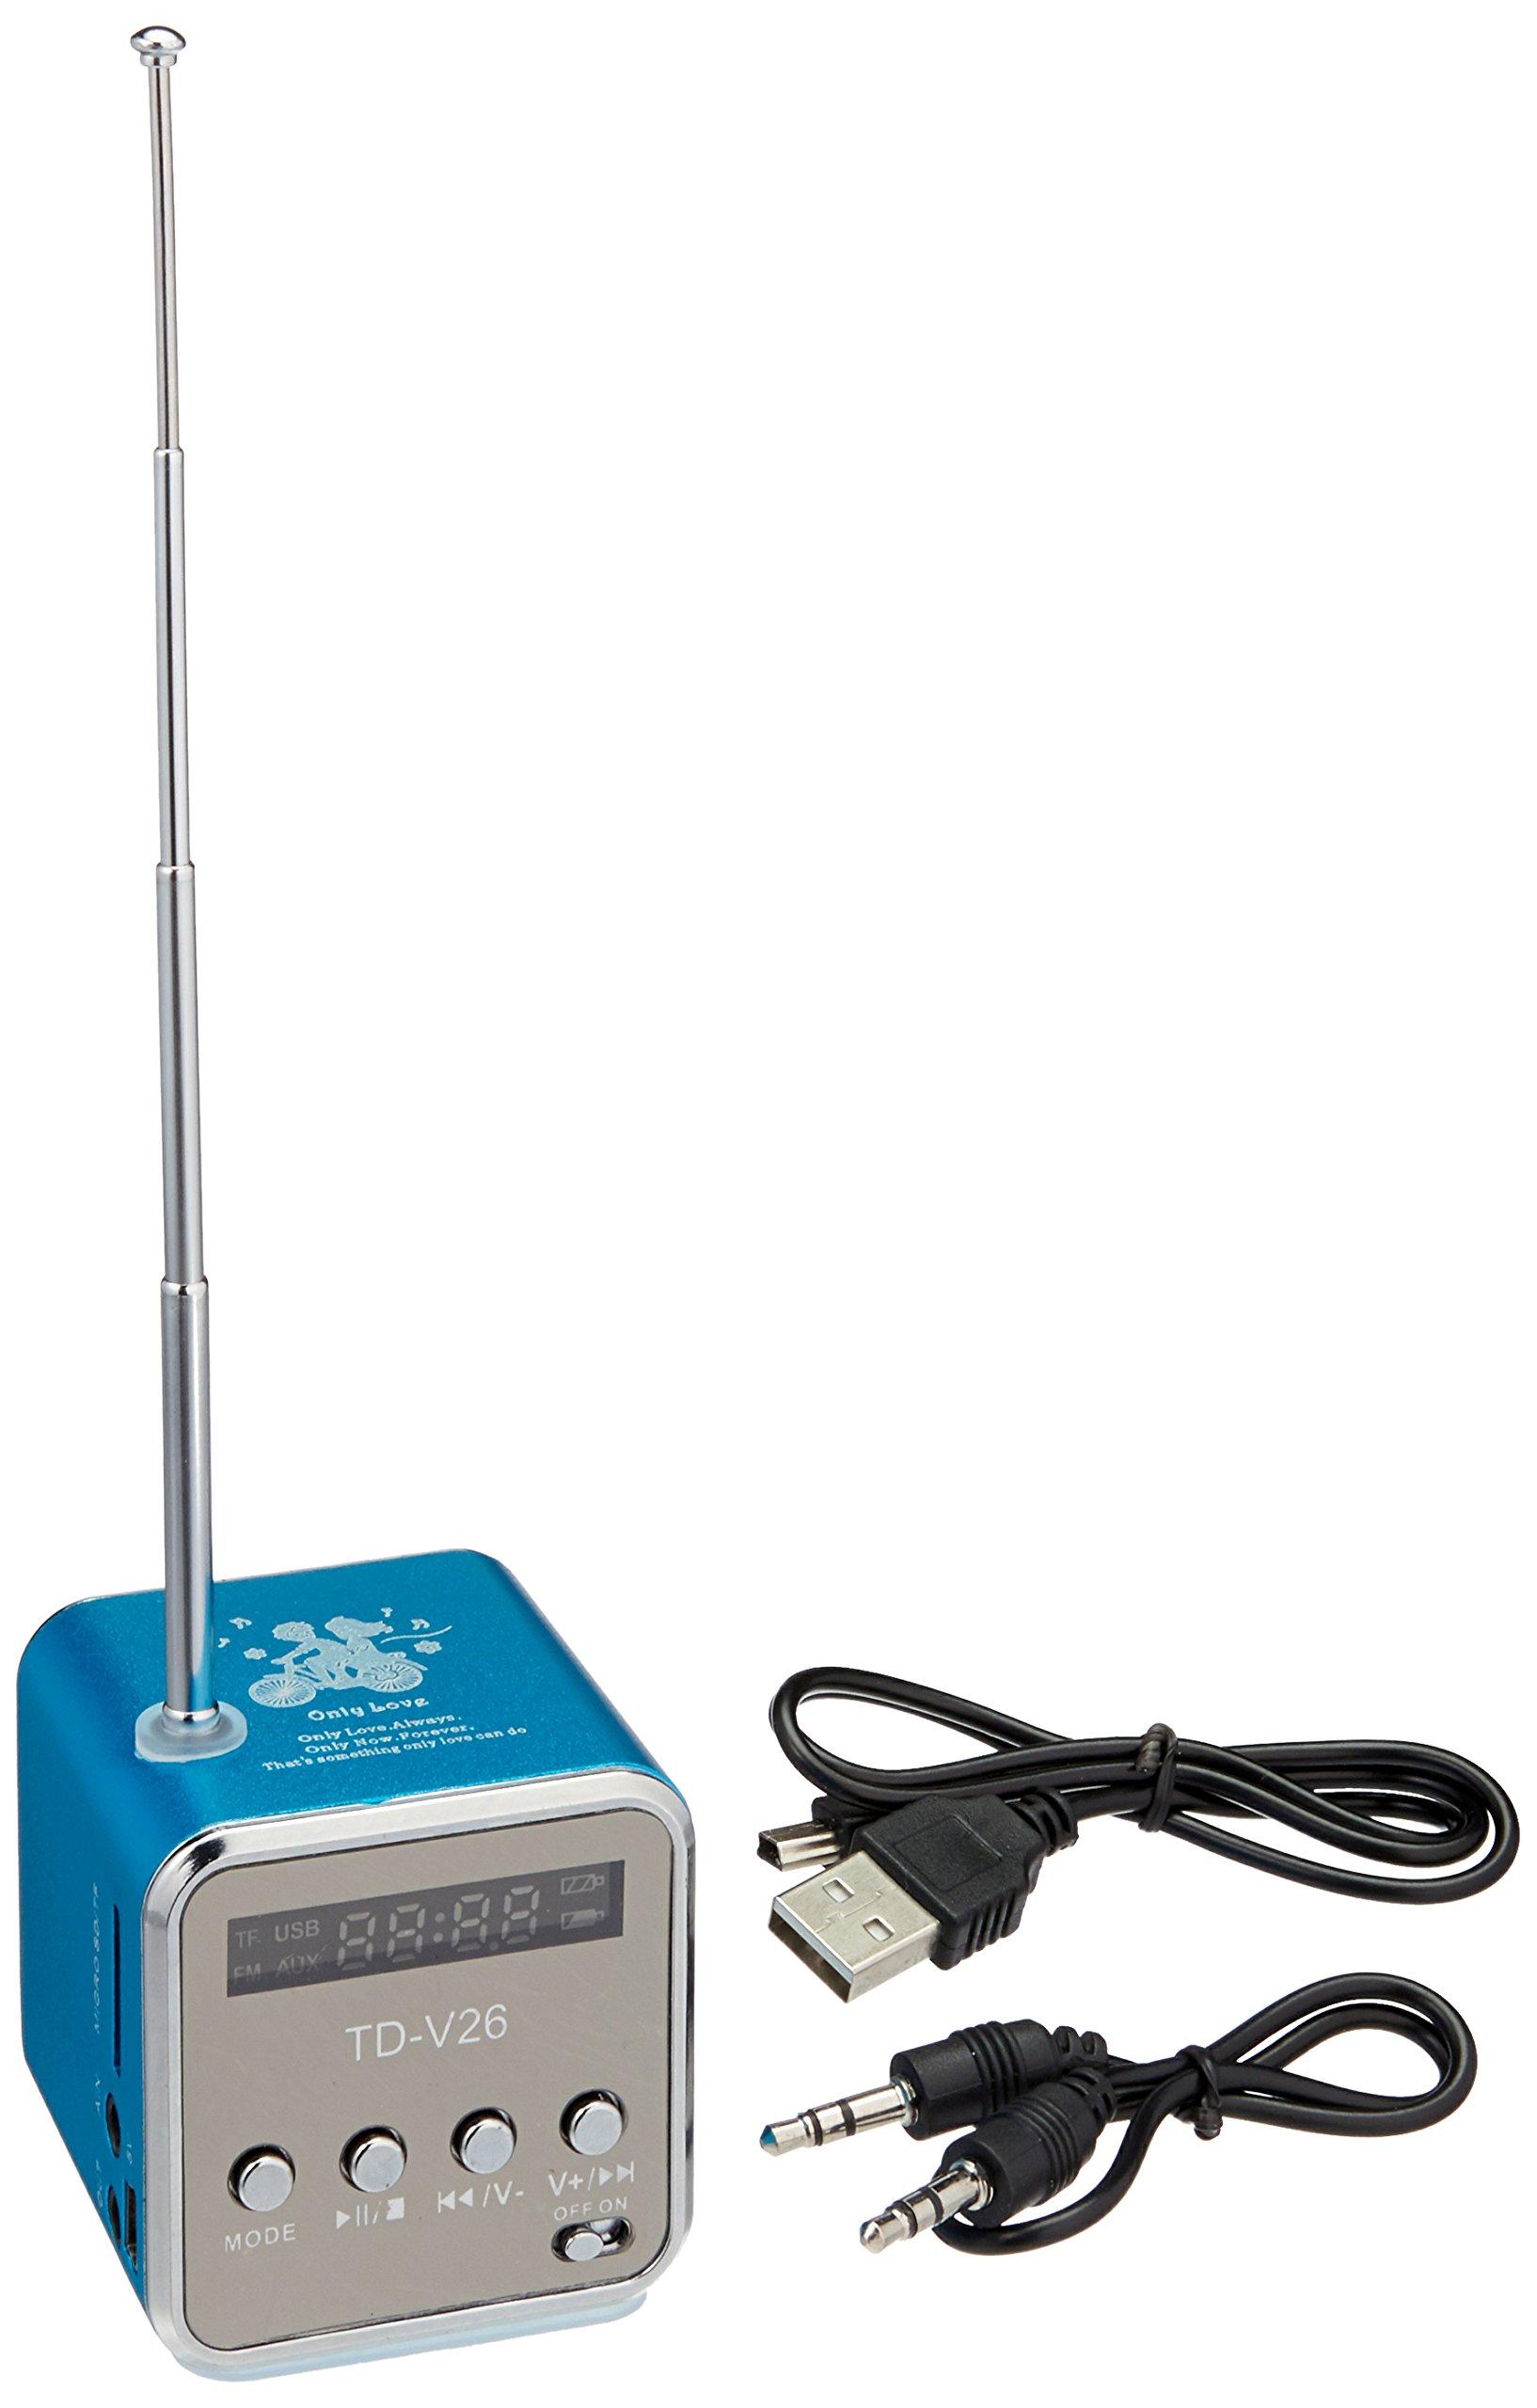 Mini Digital Portable Music MP3 Player Micro SD/TF USB Disk Speaker FM Radio TD-V26 - Blue by TD (Image #1)